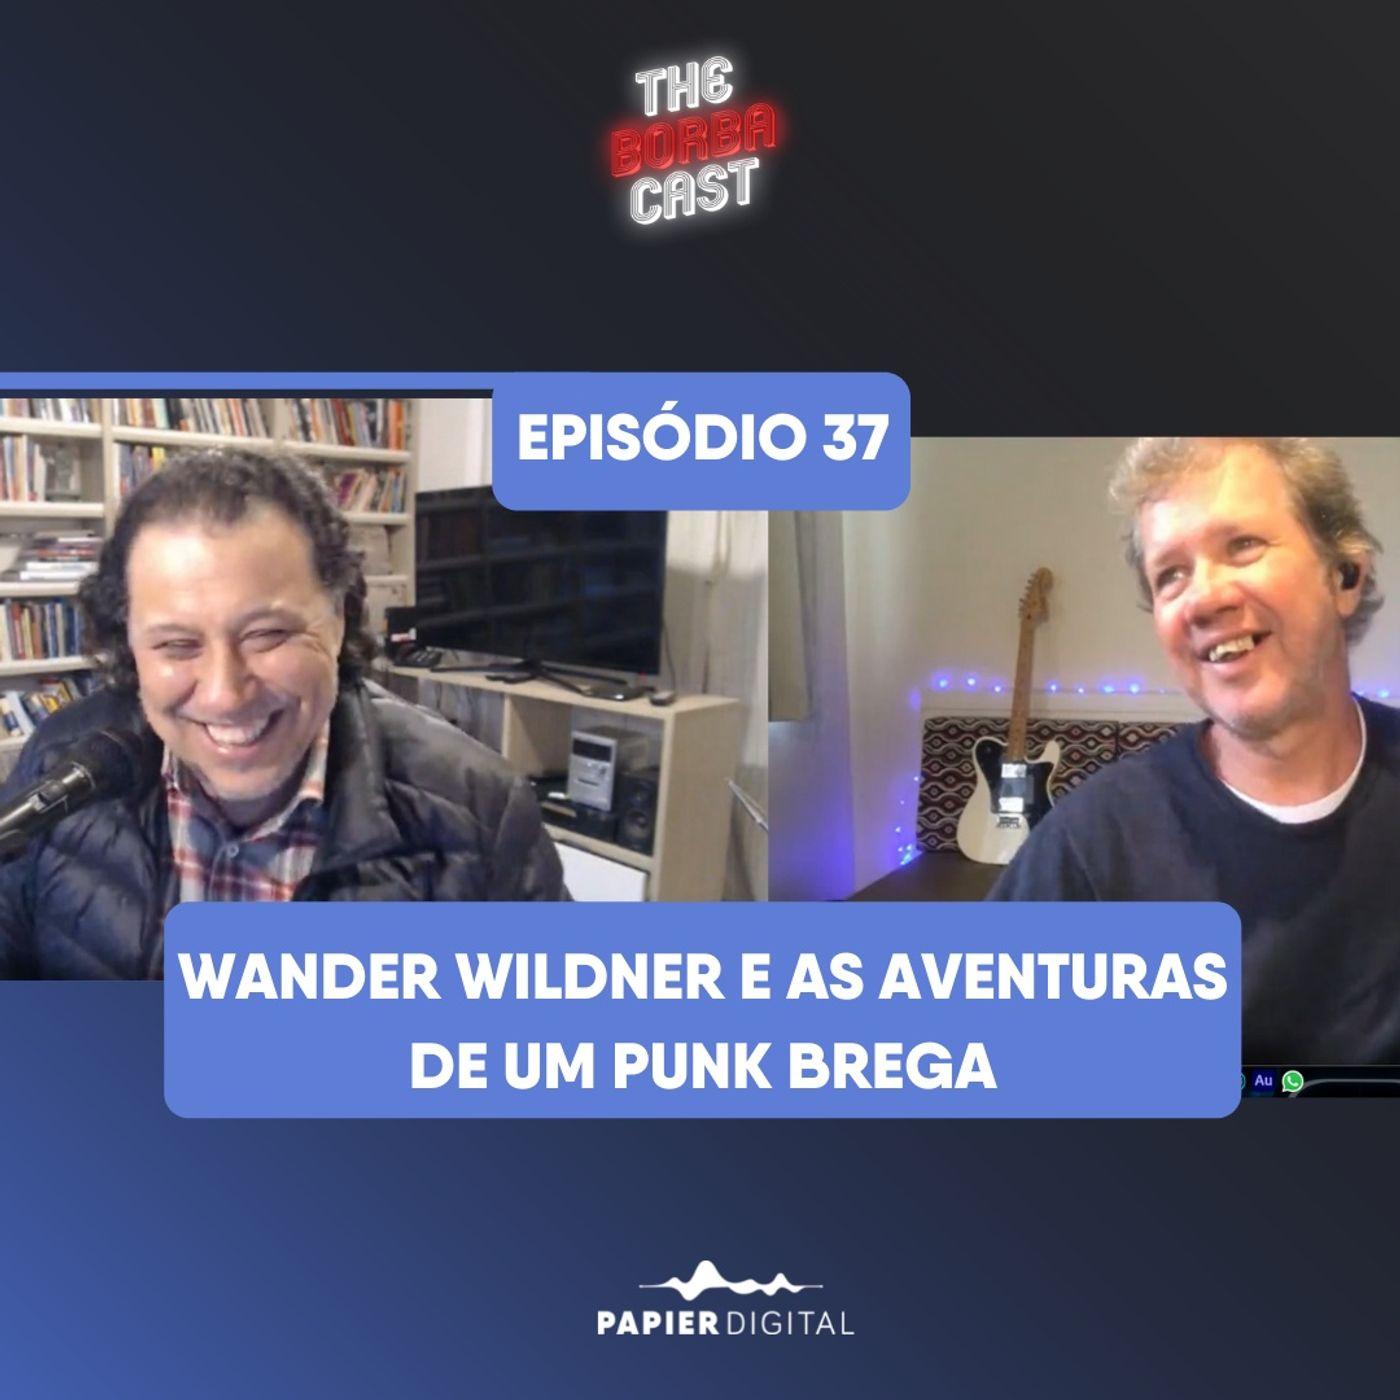 Episódio 37: Wander Wildner e as aventuras de um punk brega